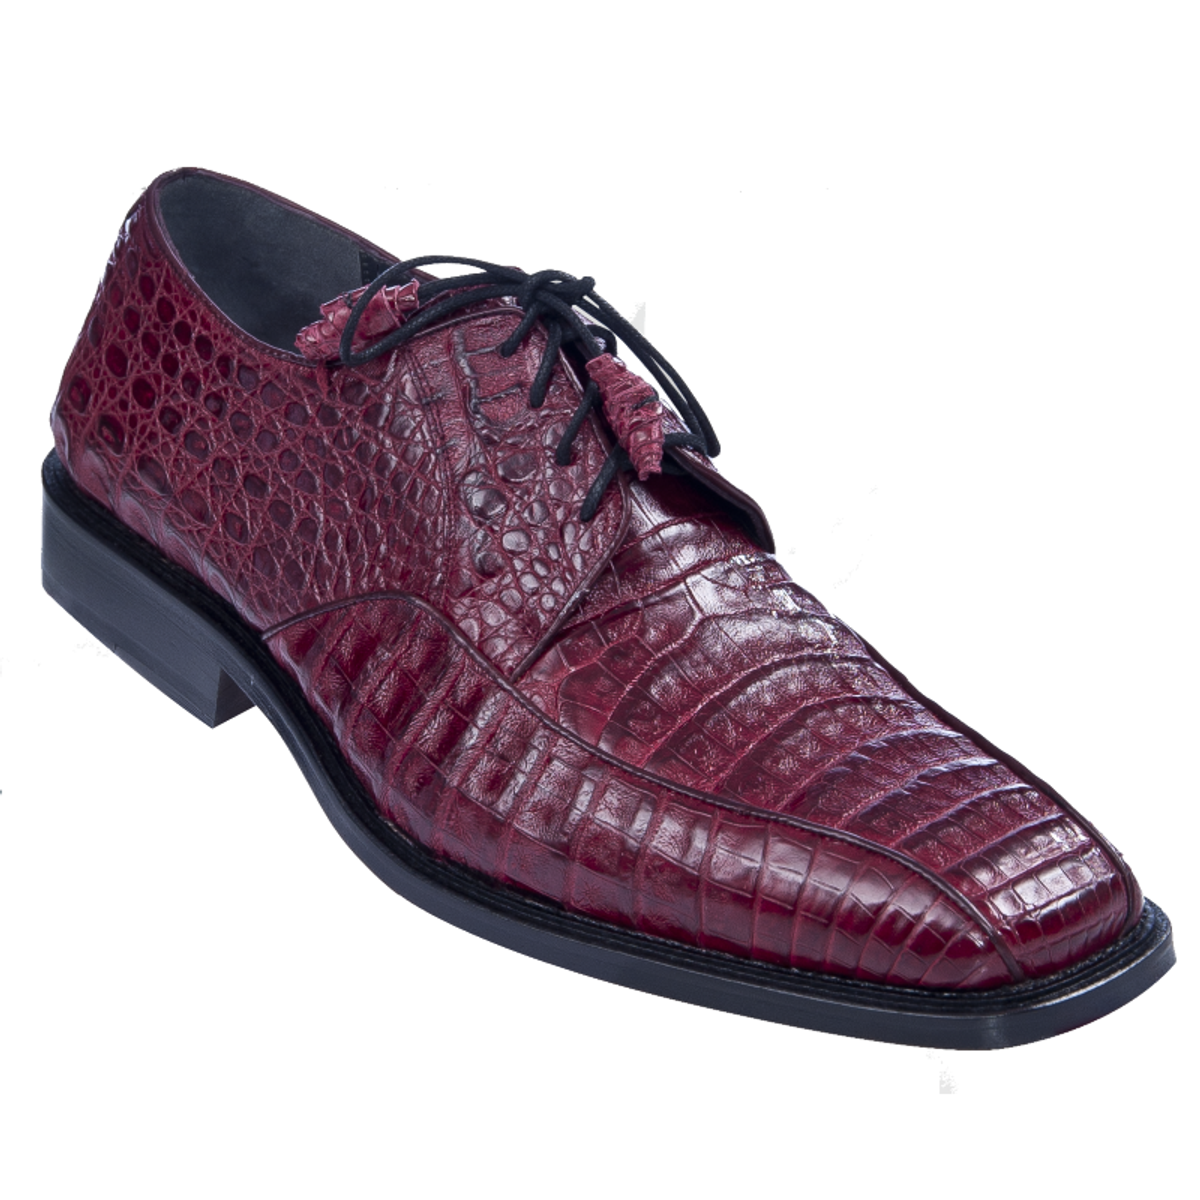 Los Altos Burgundy Crocodile Bike Toe Shoes ZV038206